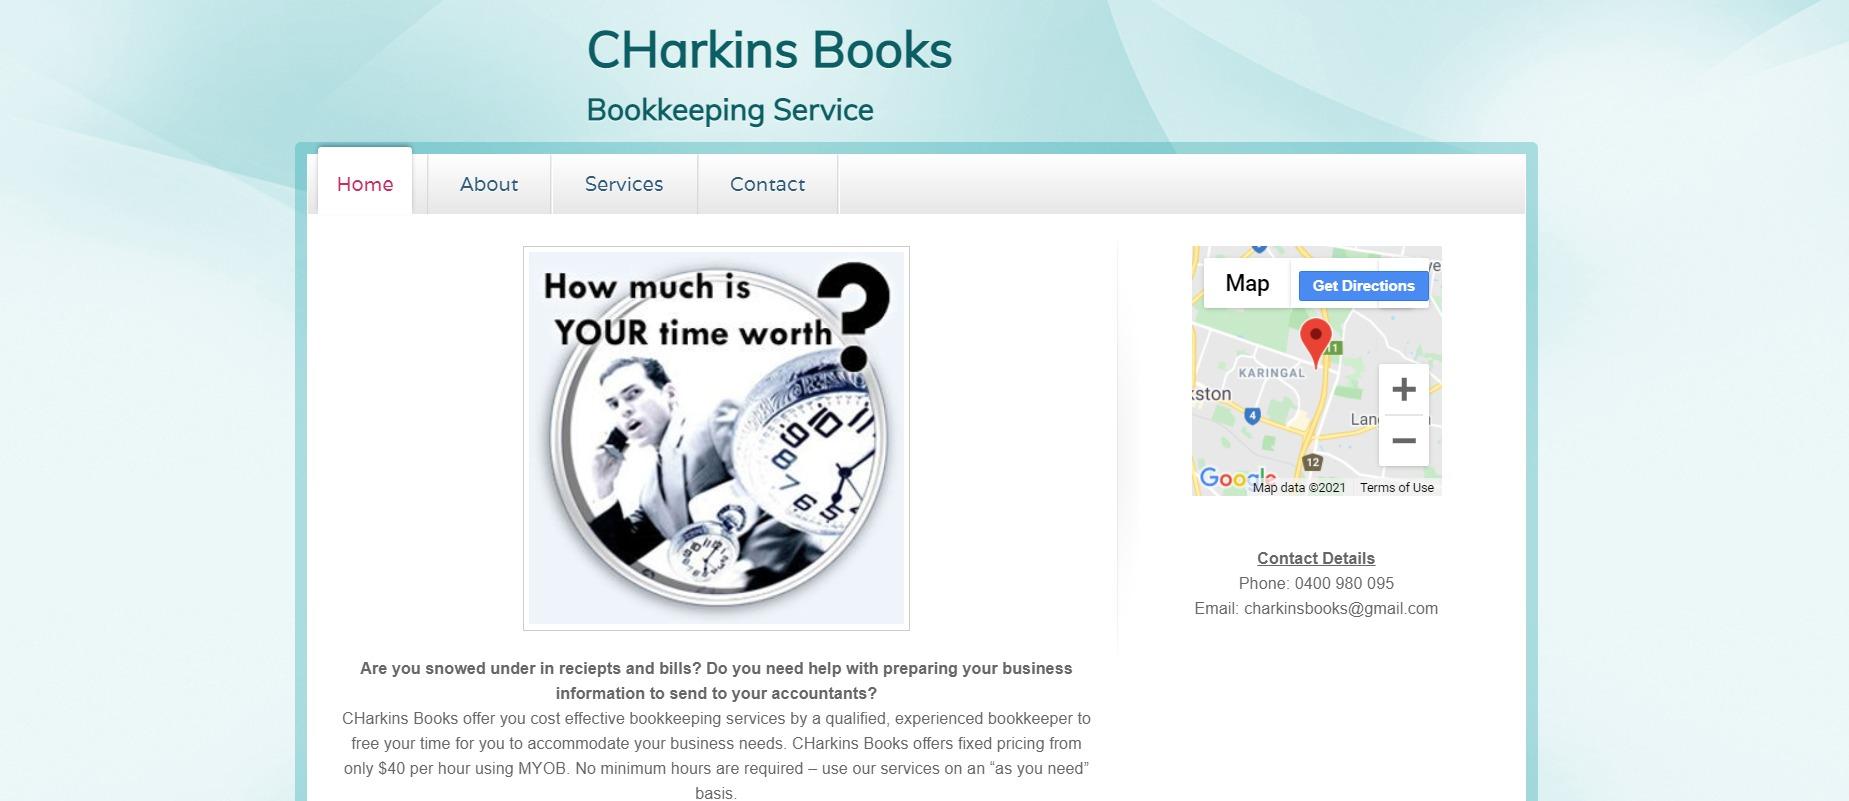 Charkins Books